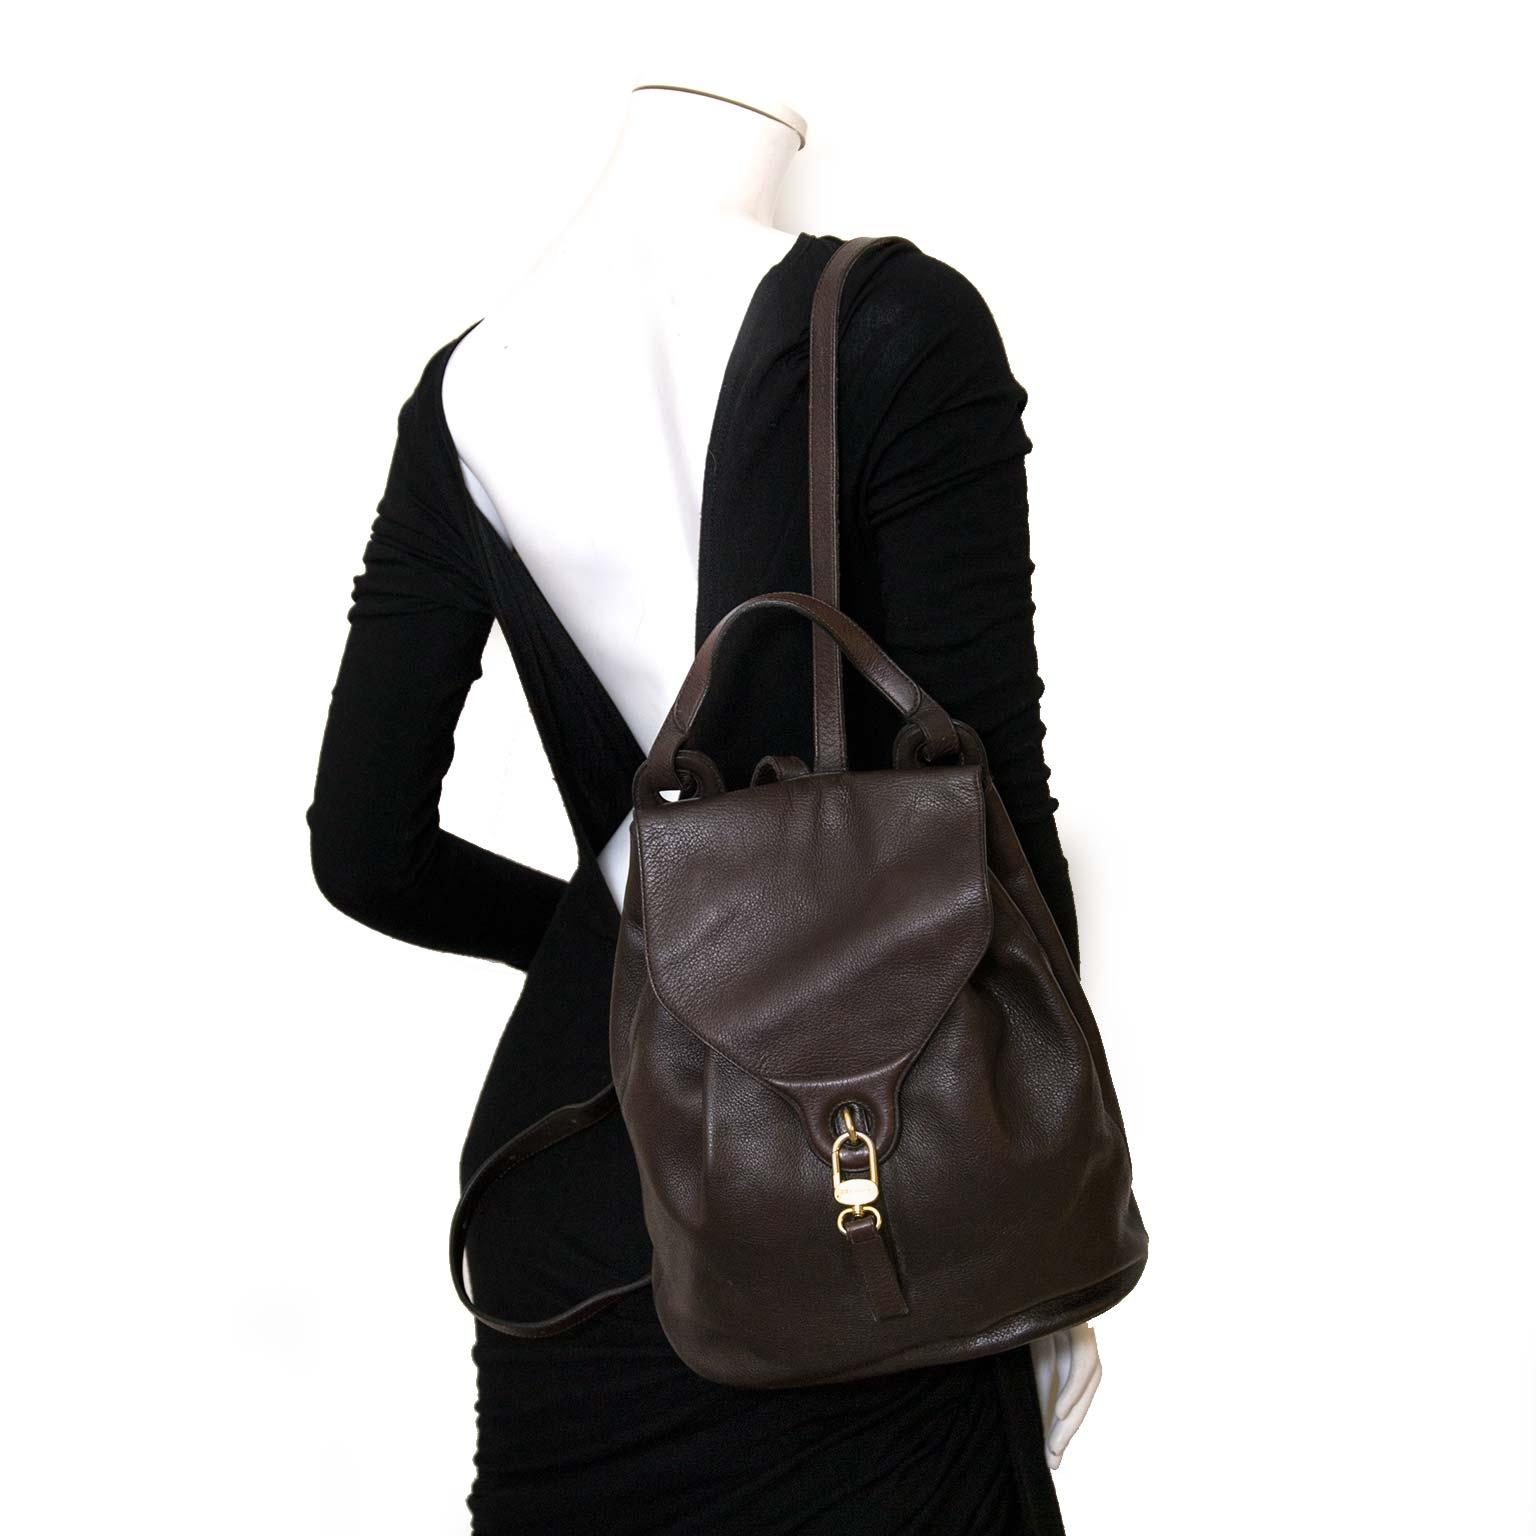 Delvaux rugzakken nu online bij Labellov vintage mode webshop